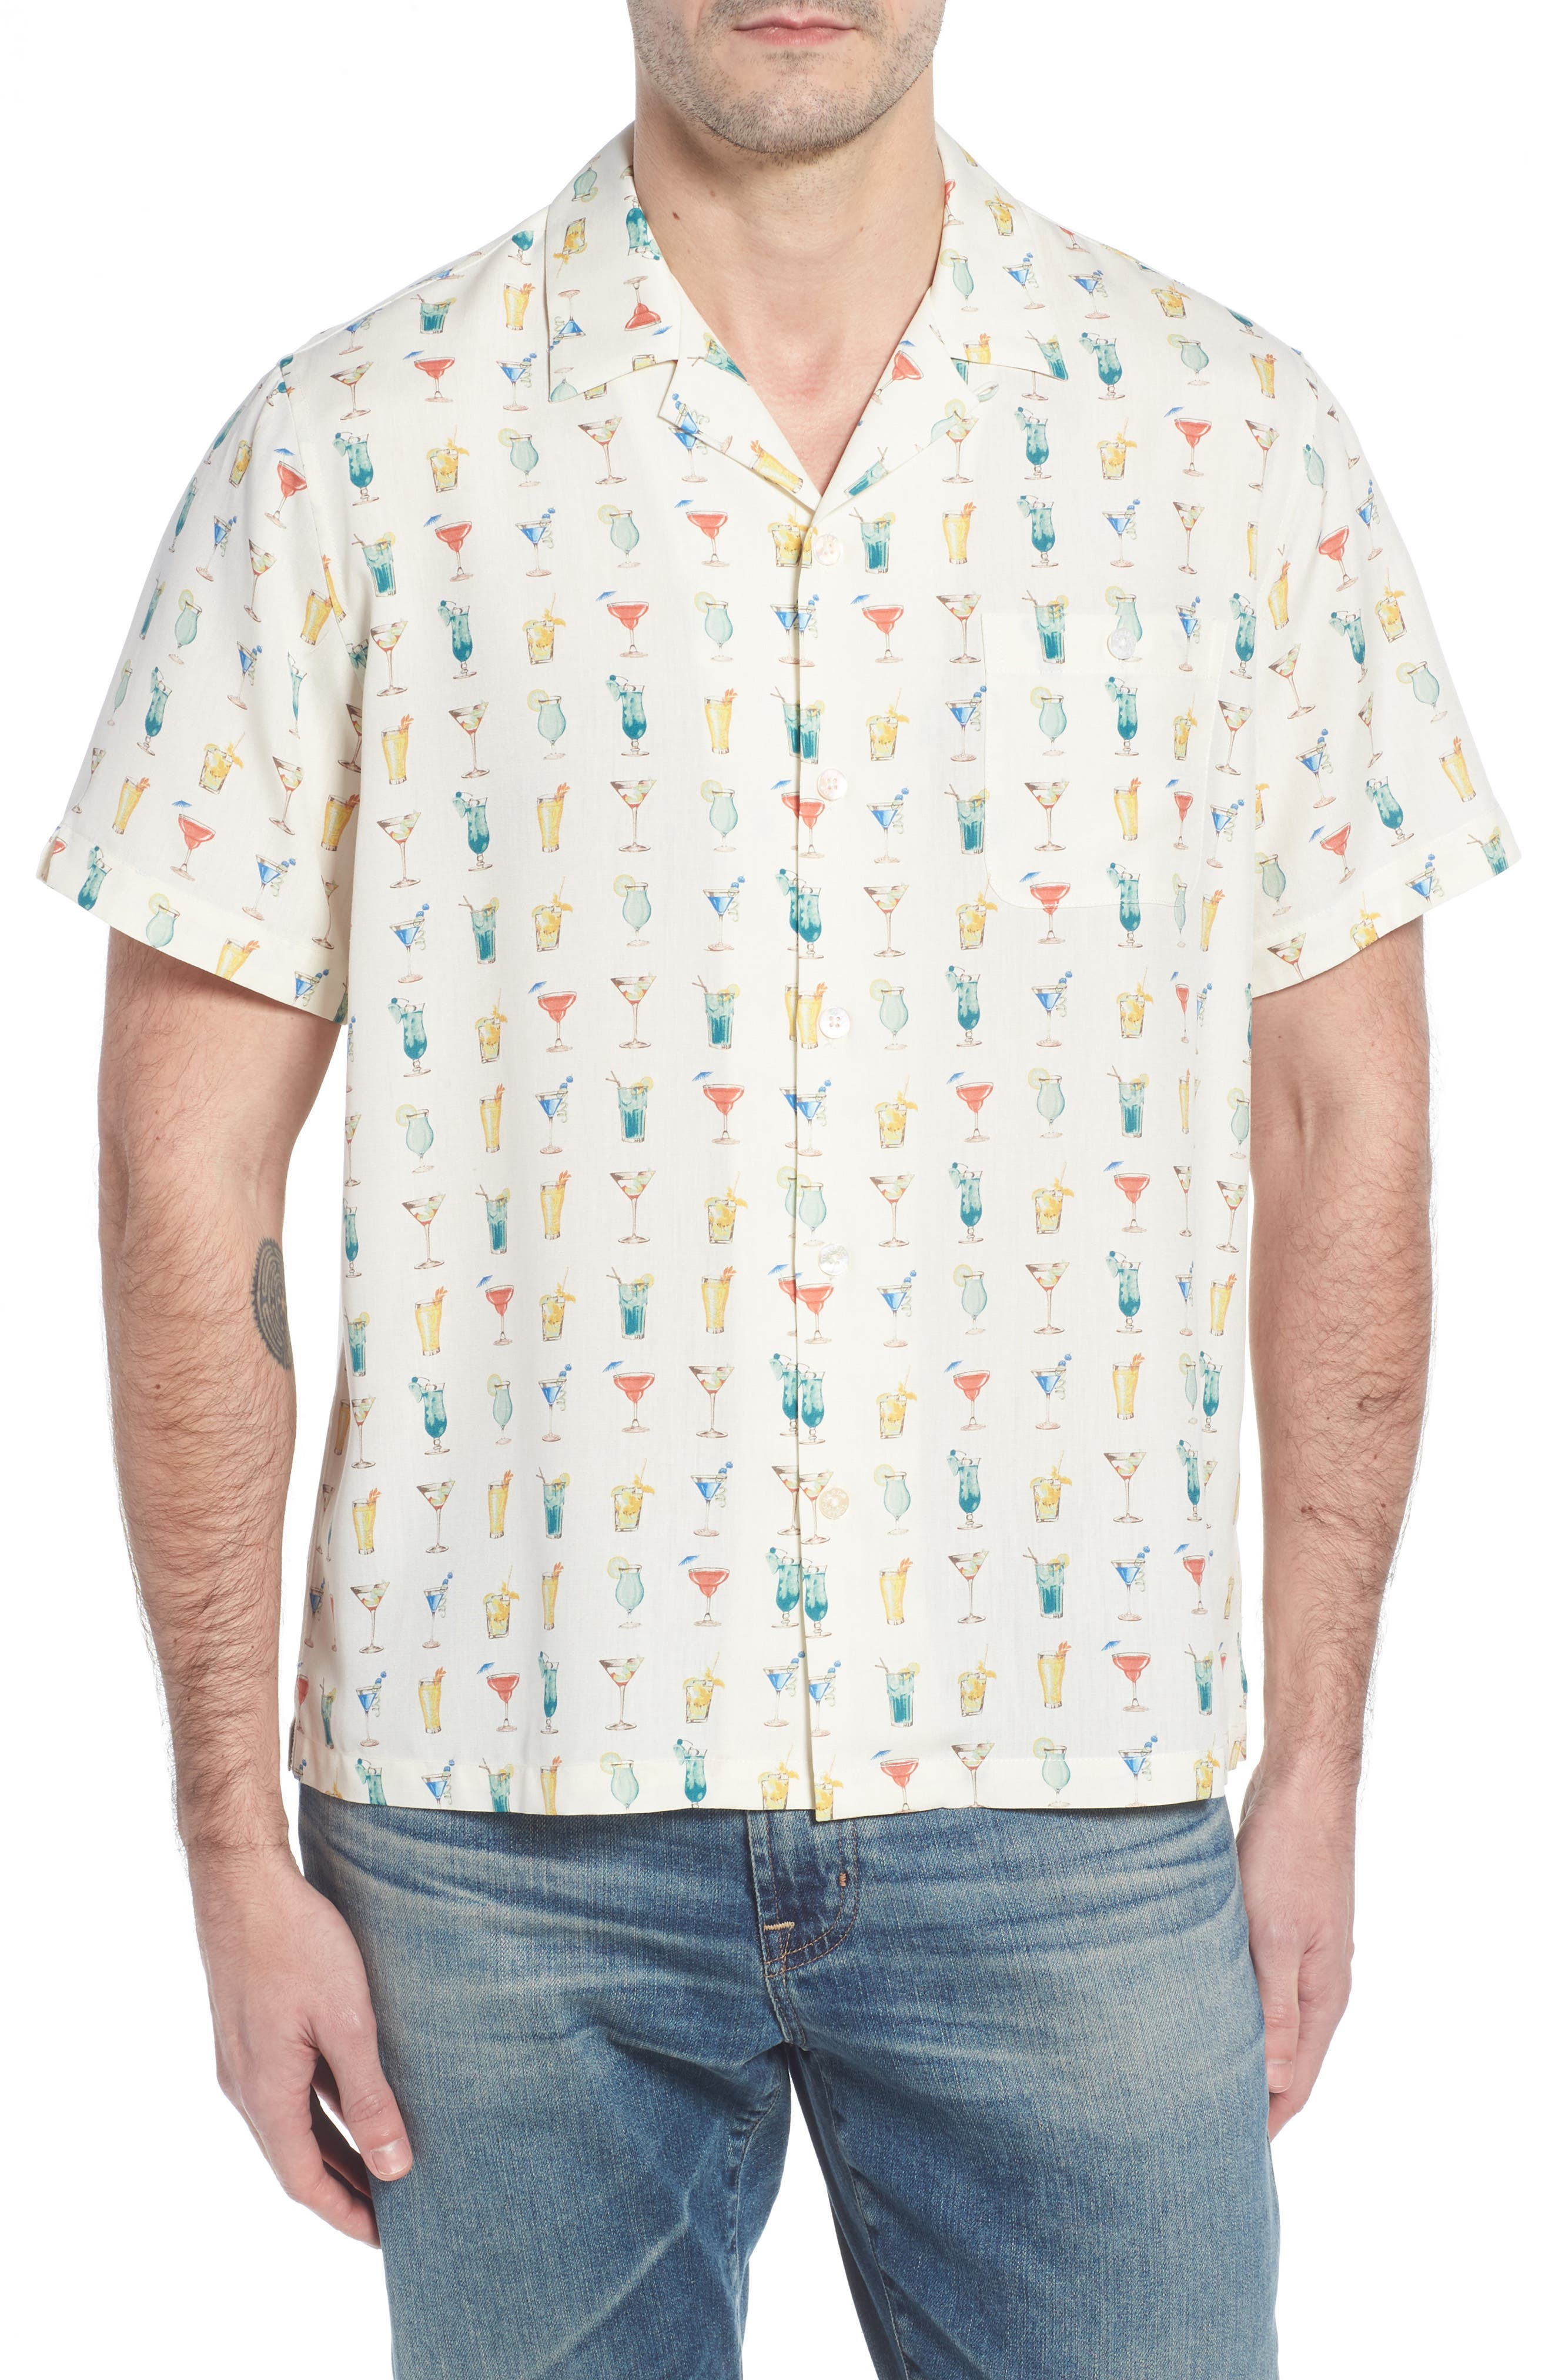 Mixalot Trim Fit Silk Blend Camp Shirt,                         Main,                         color, Off White